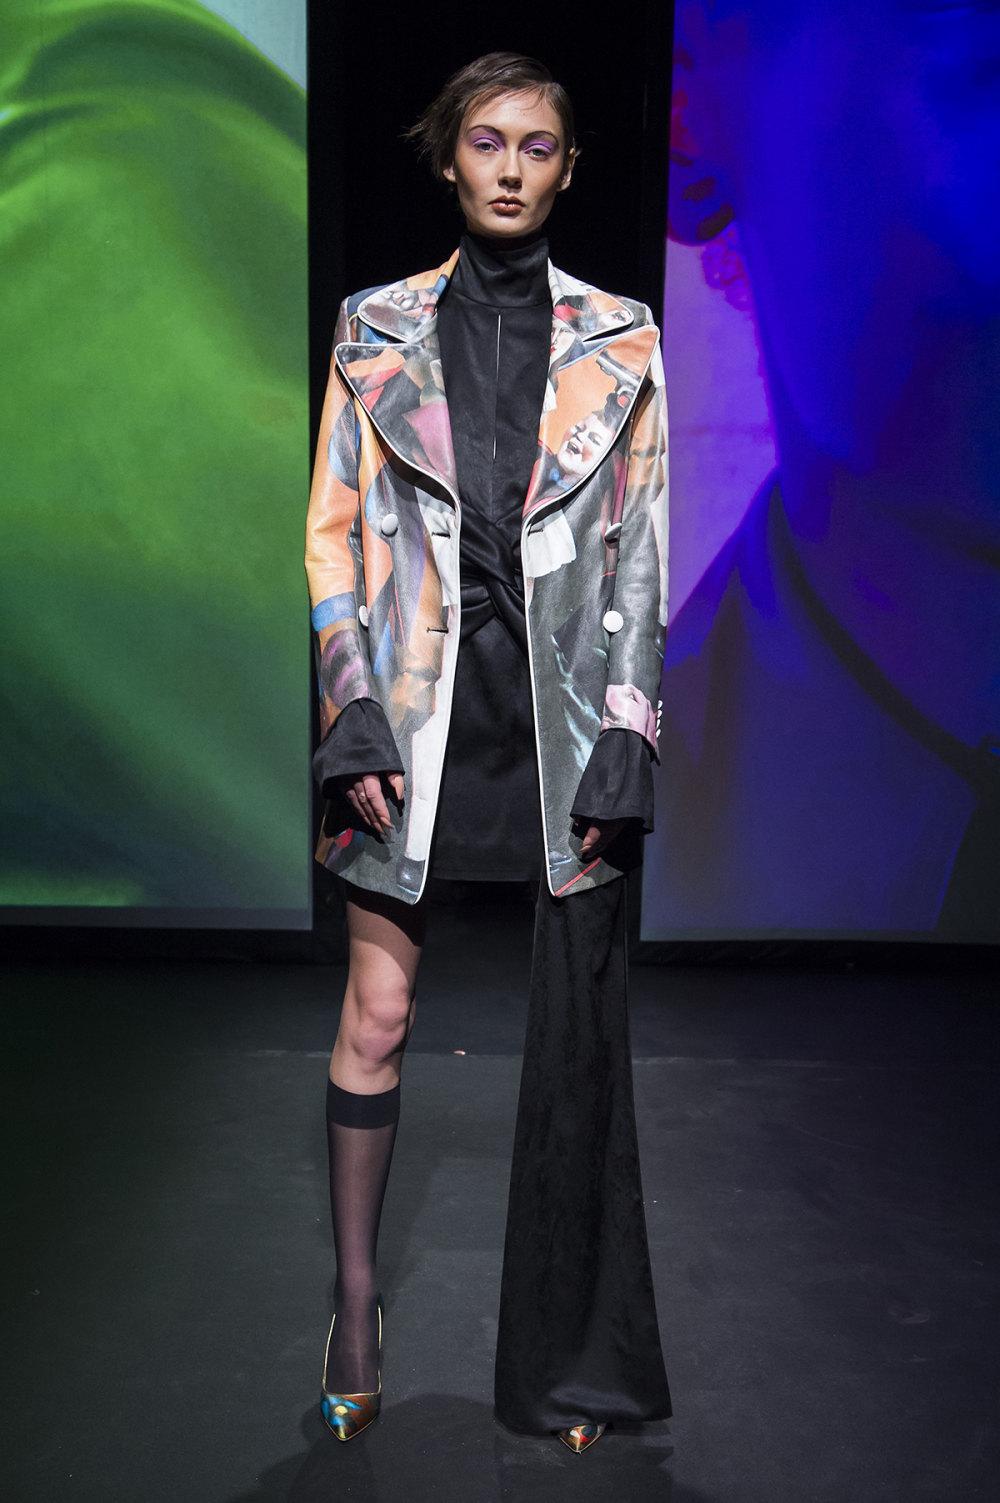 16Arlington时装系列标志性的時尚单色西装外还有更大胆的版本-5.jpg